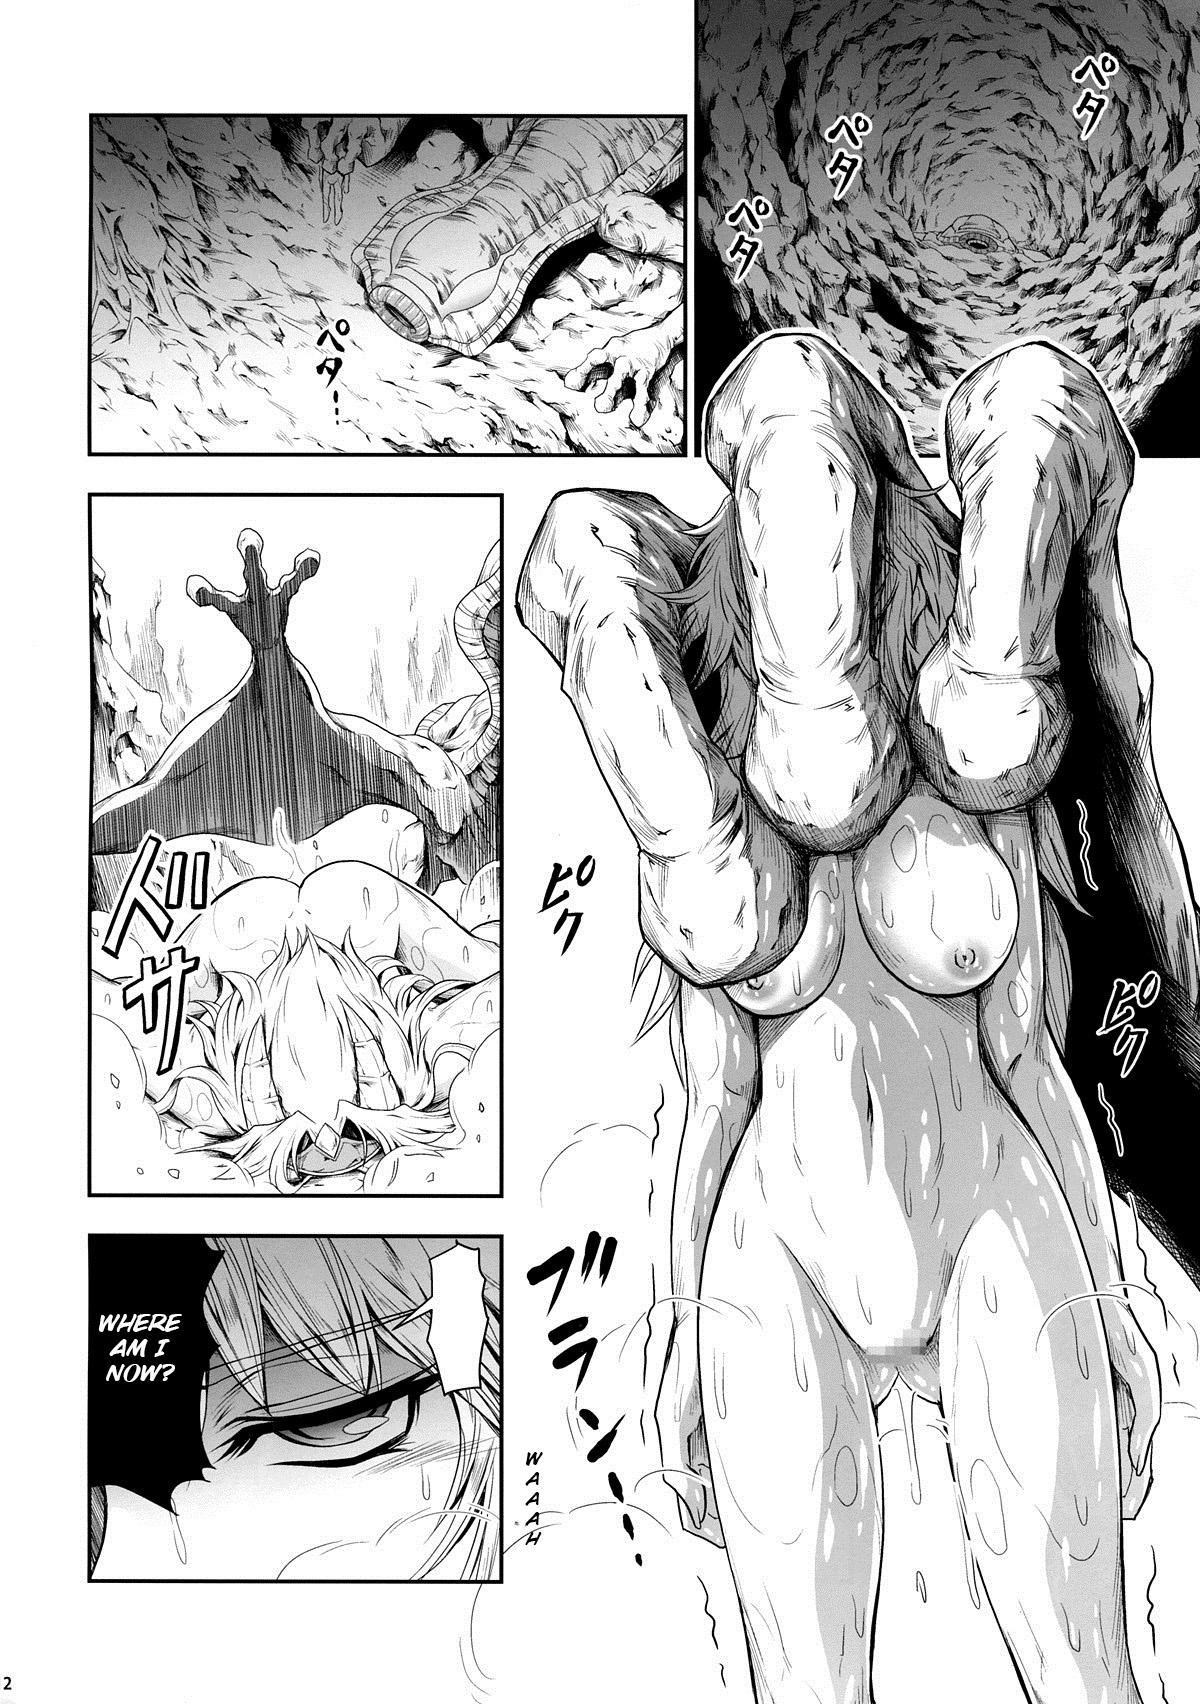 Solo Hunter no Seitai 4 The third part 11